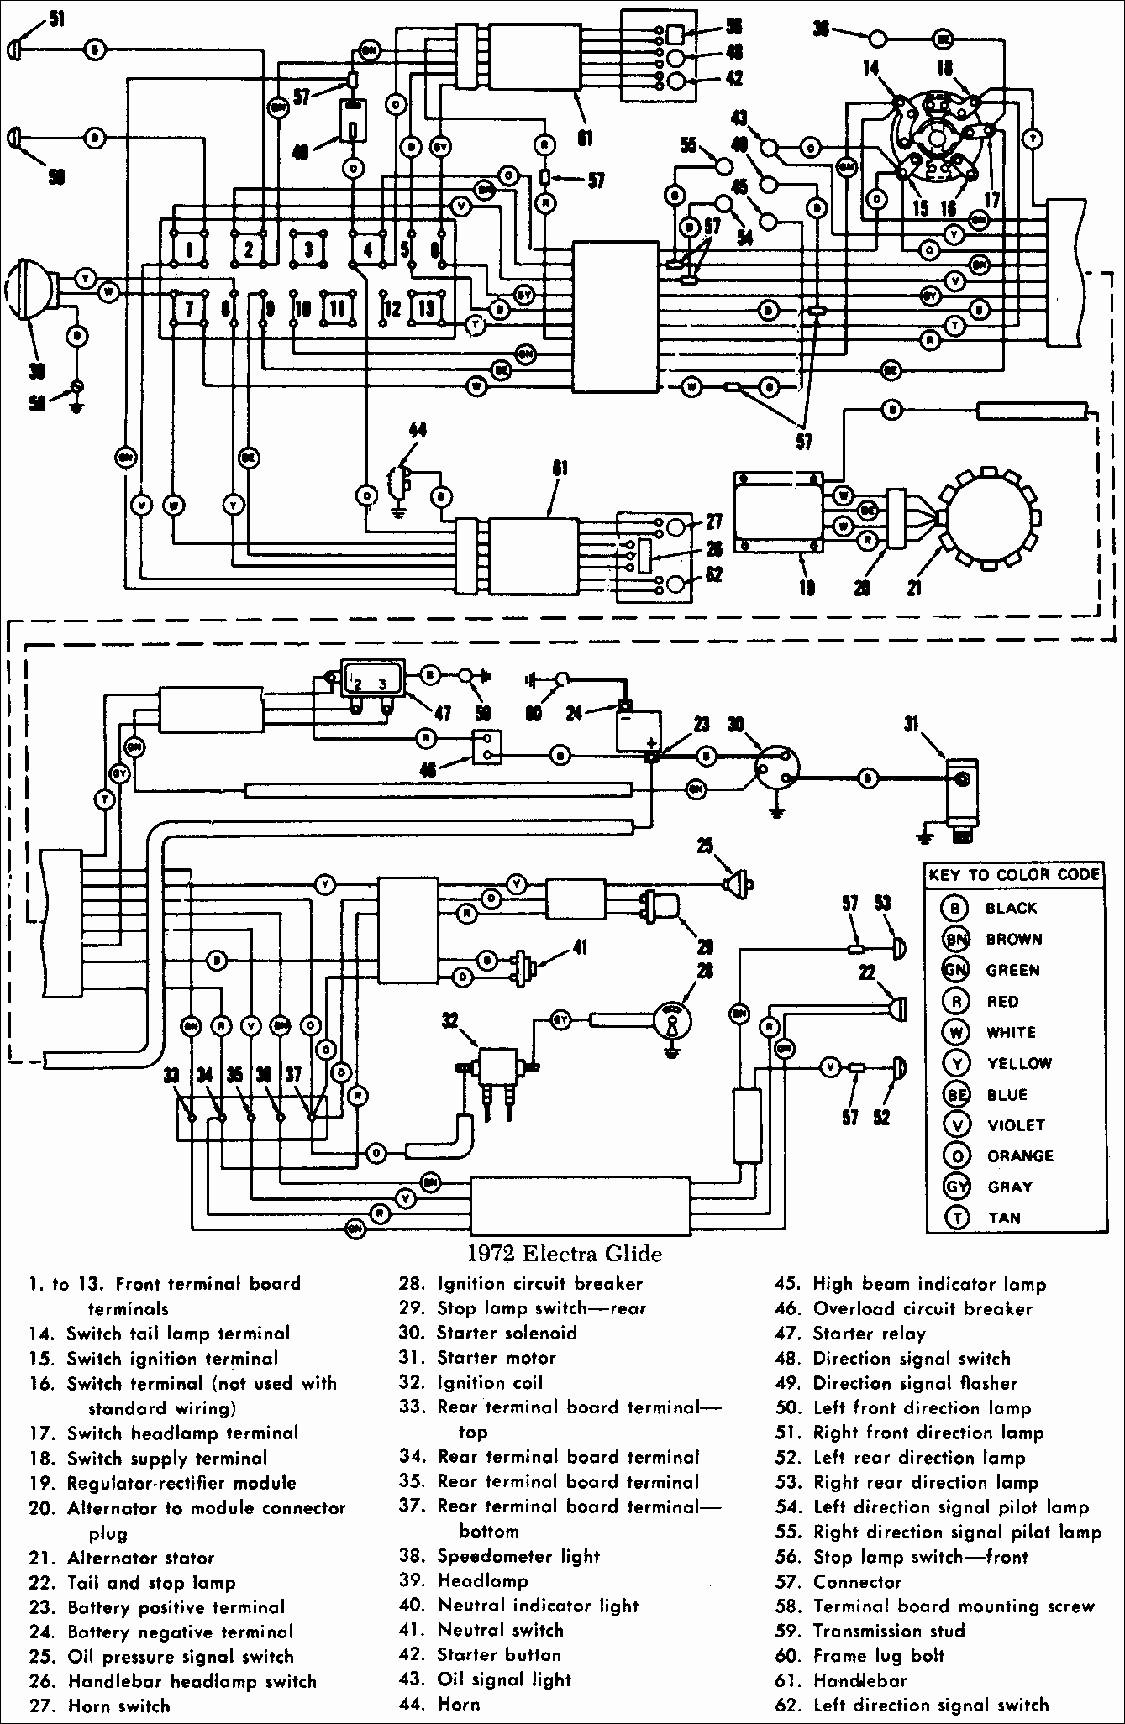 Klr 650 Wiring Diagram Awesome